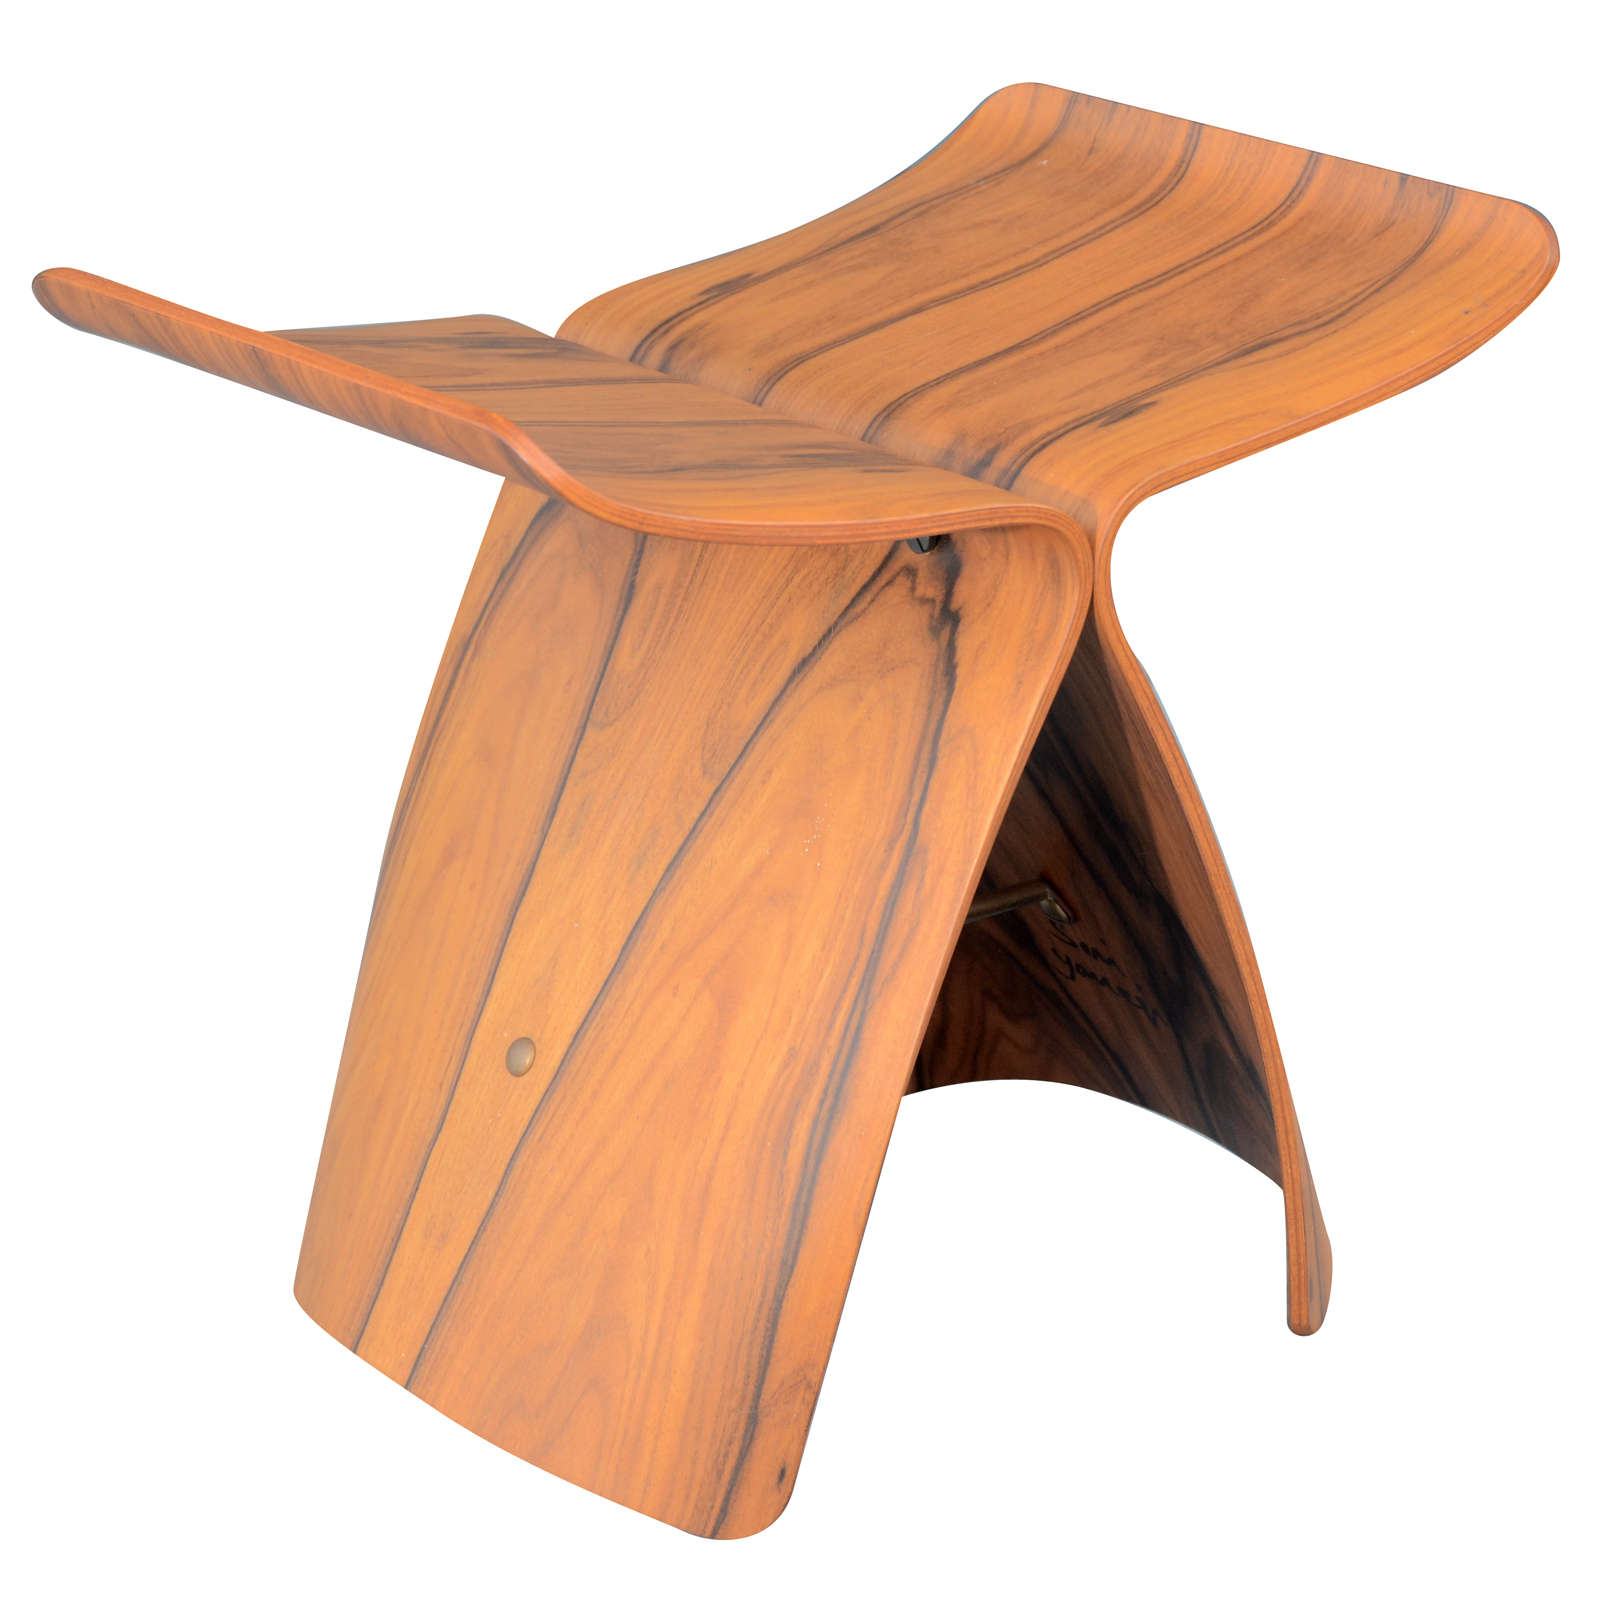 Butterfly chair sori yanagi - Vintage Sori Yanagi Rosewood Butterfly Stool 1